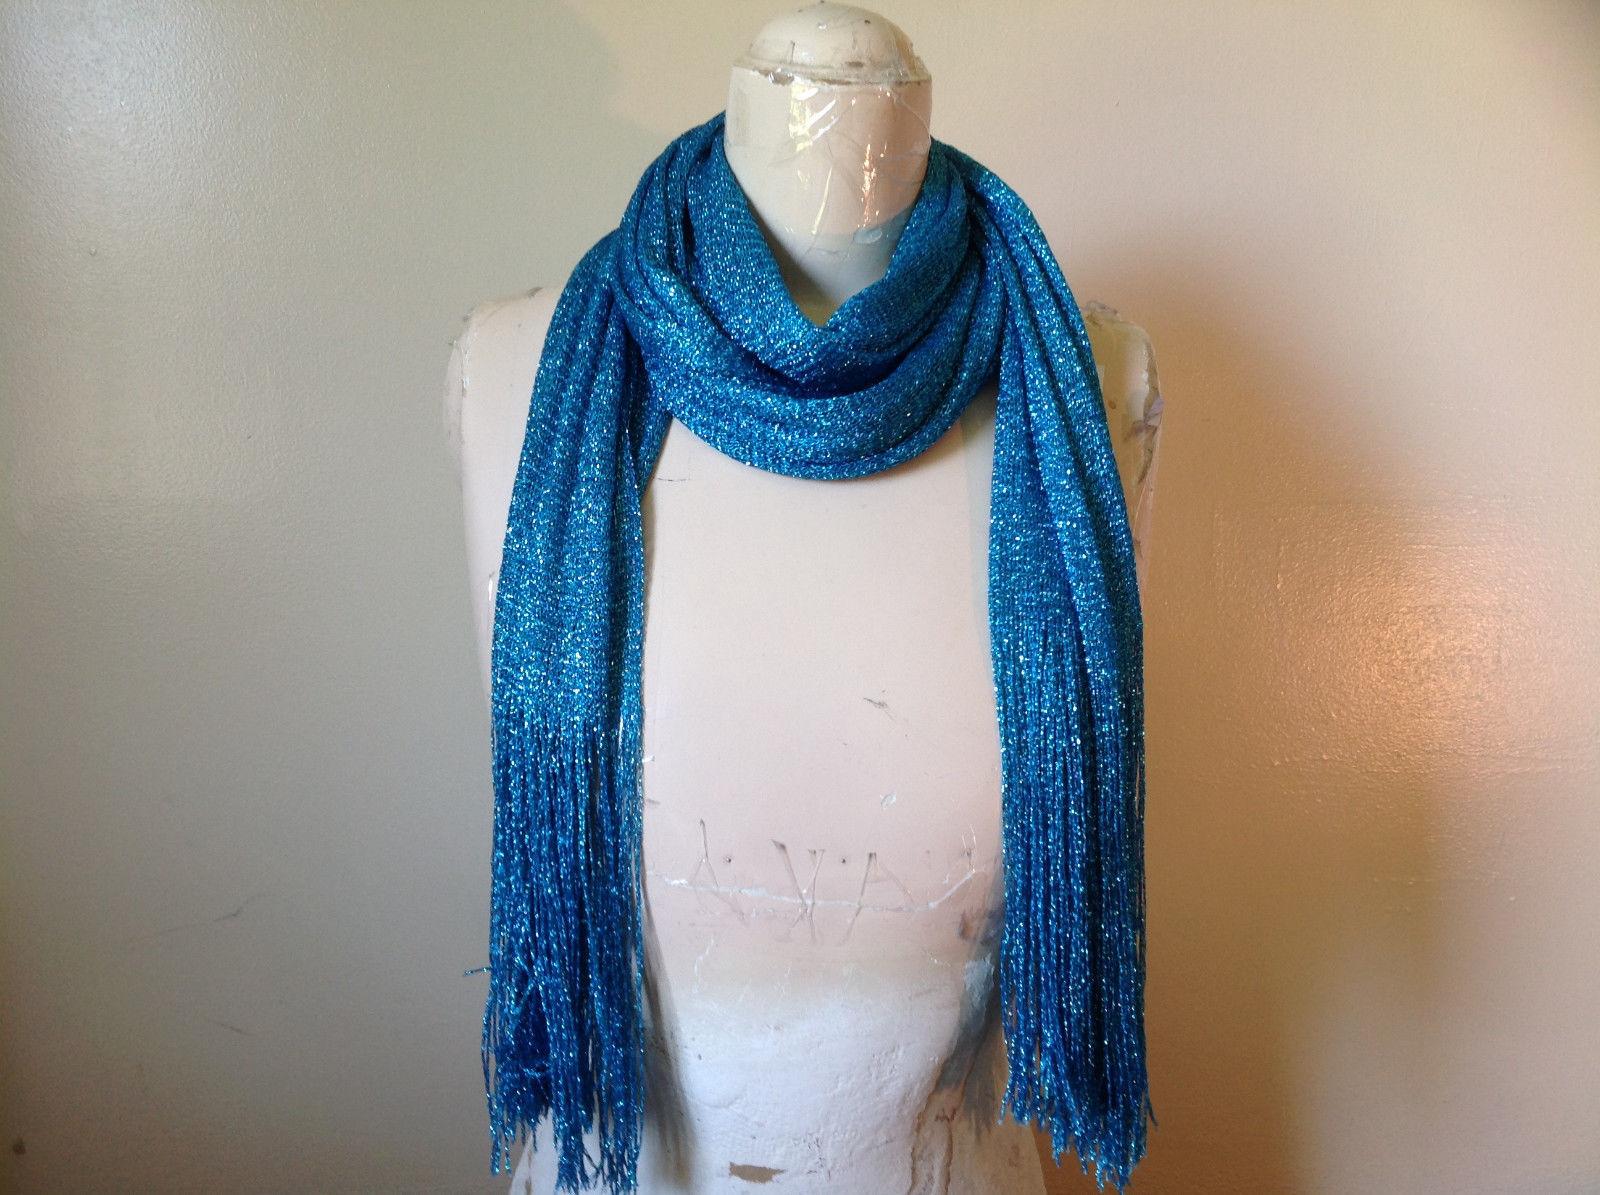 Stunning Blue Metallic Shine Tasseled Fashion Scarf Tag Says Fashion Scarf